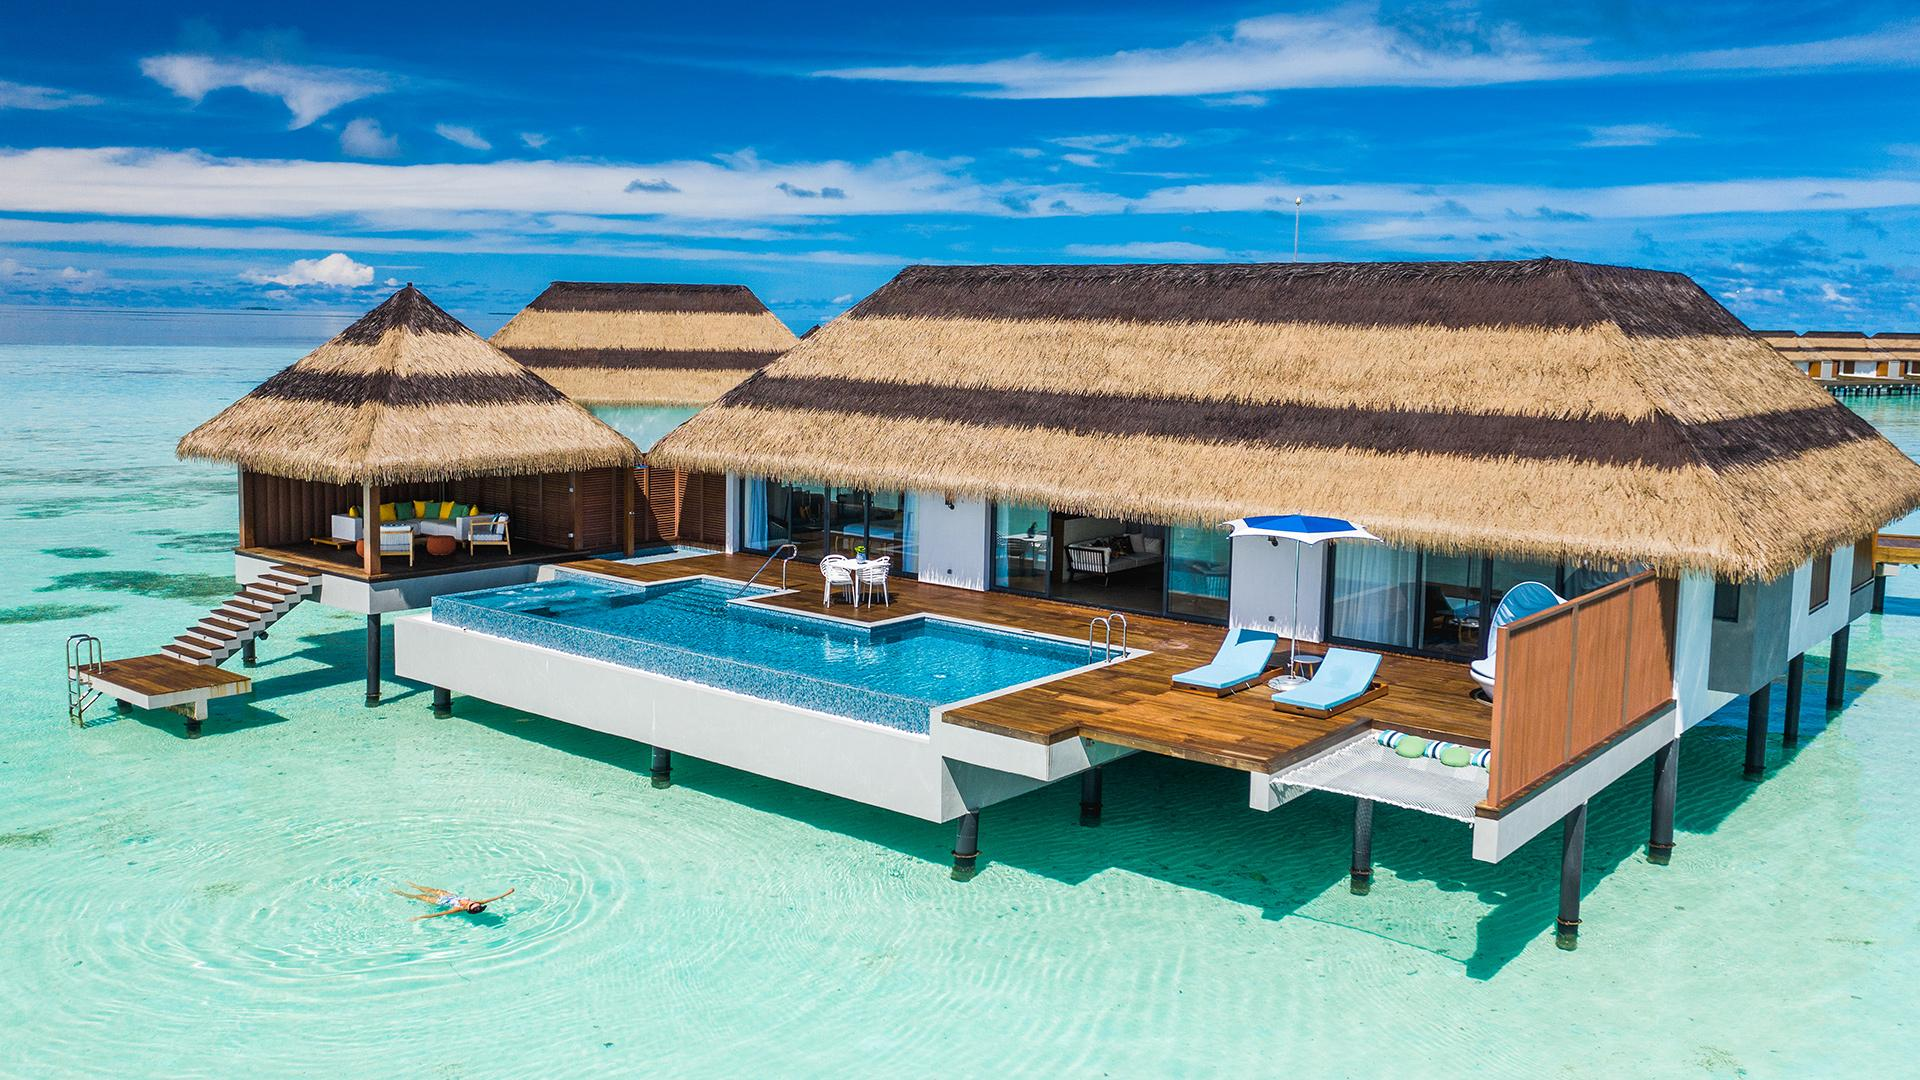 Two-Bedroom Ocean Pool Villa image 1 at Pullman Maldives Maamutaa Resort by null, Upper South Province, Maldives